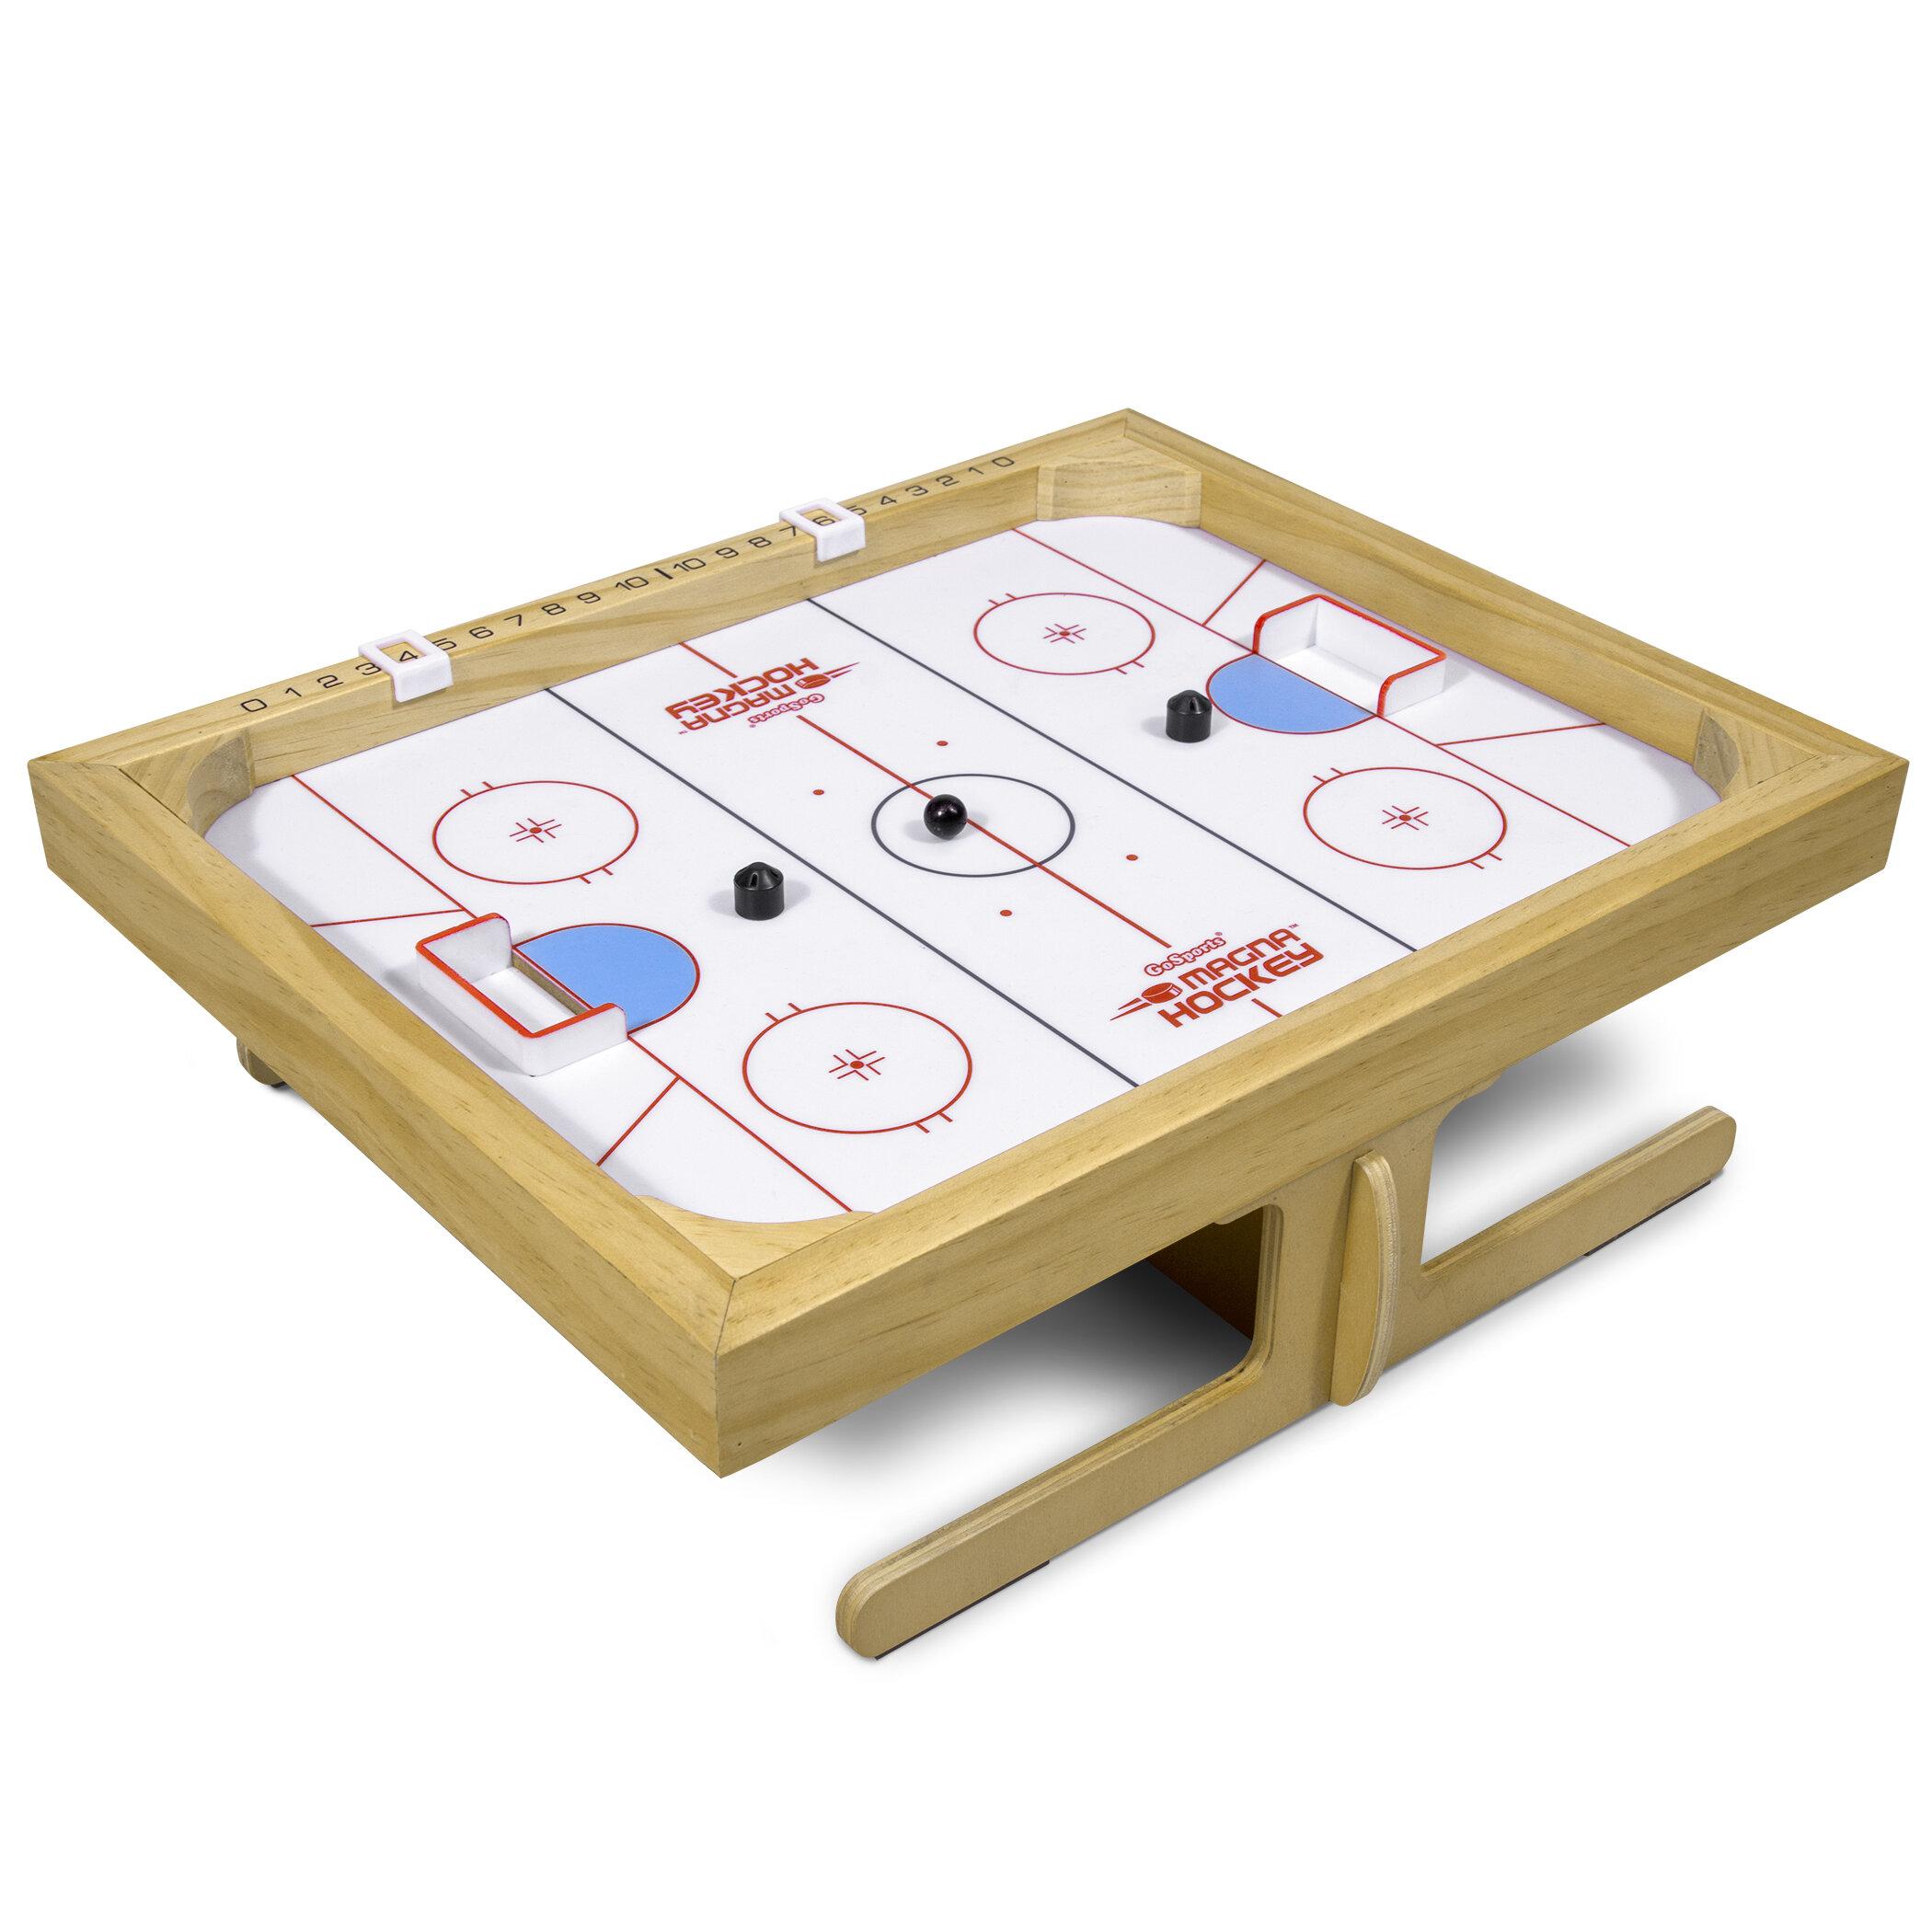 Wooden Mini Tabletop Desktop Board Football Hockey Soccer Game Fun Kids Gift